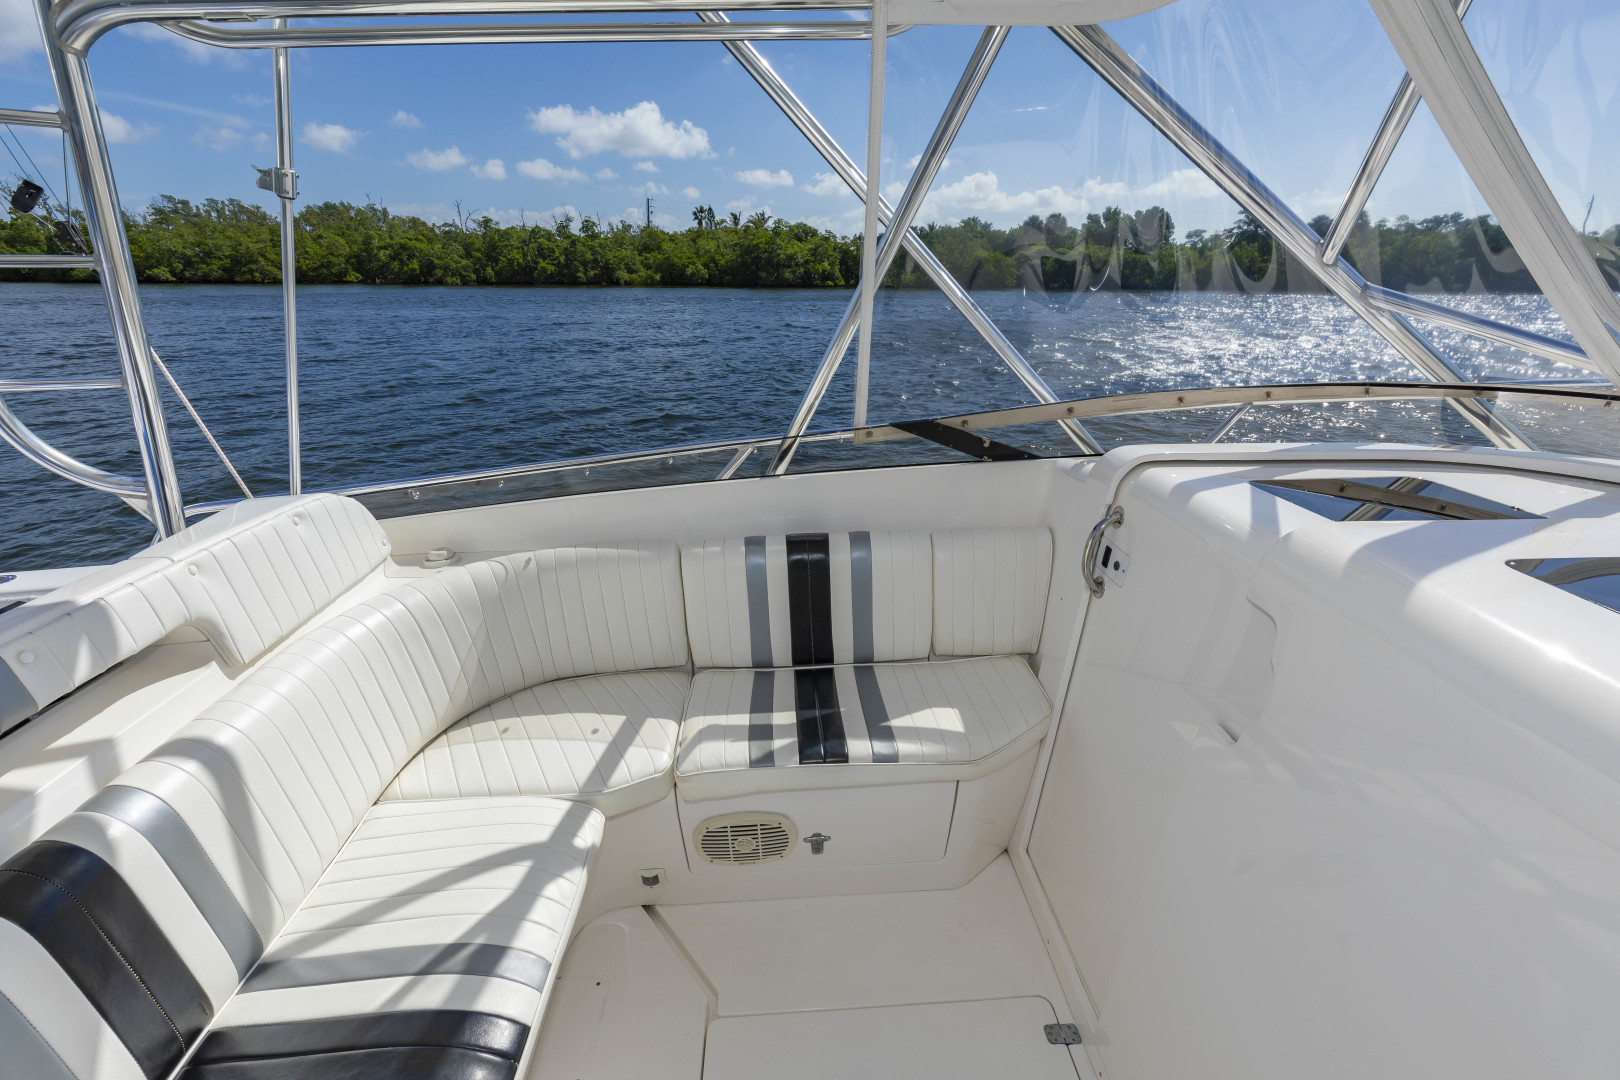 Intrepid-377 Walkaround 2005-Rock Boat REFIT 2018 Dania Beach-Florida-United States-377 Intrepid Helm 2-1511545 | Thumbnail